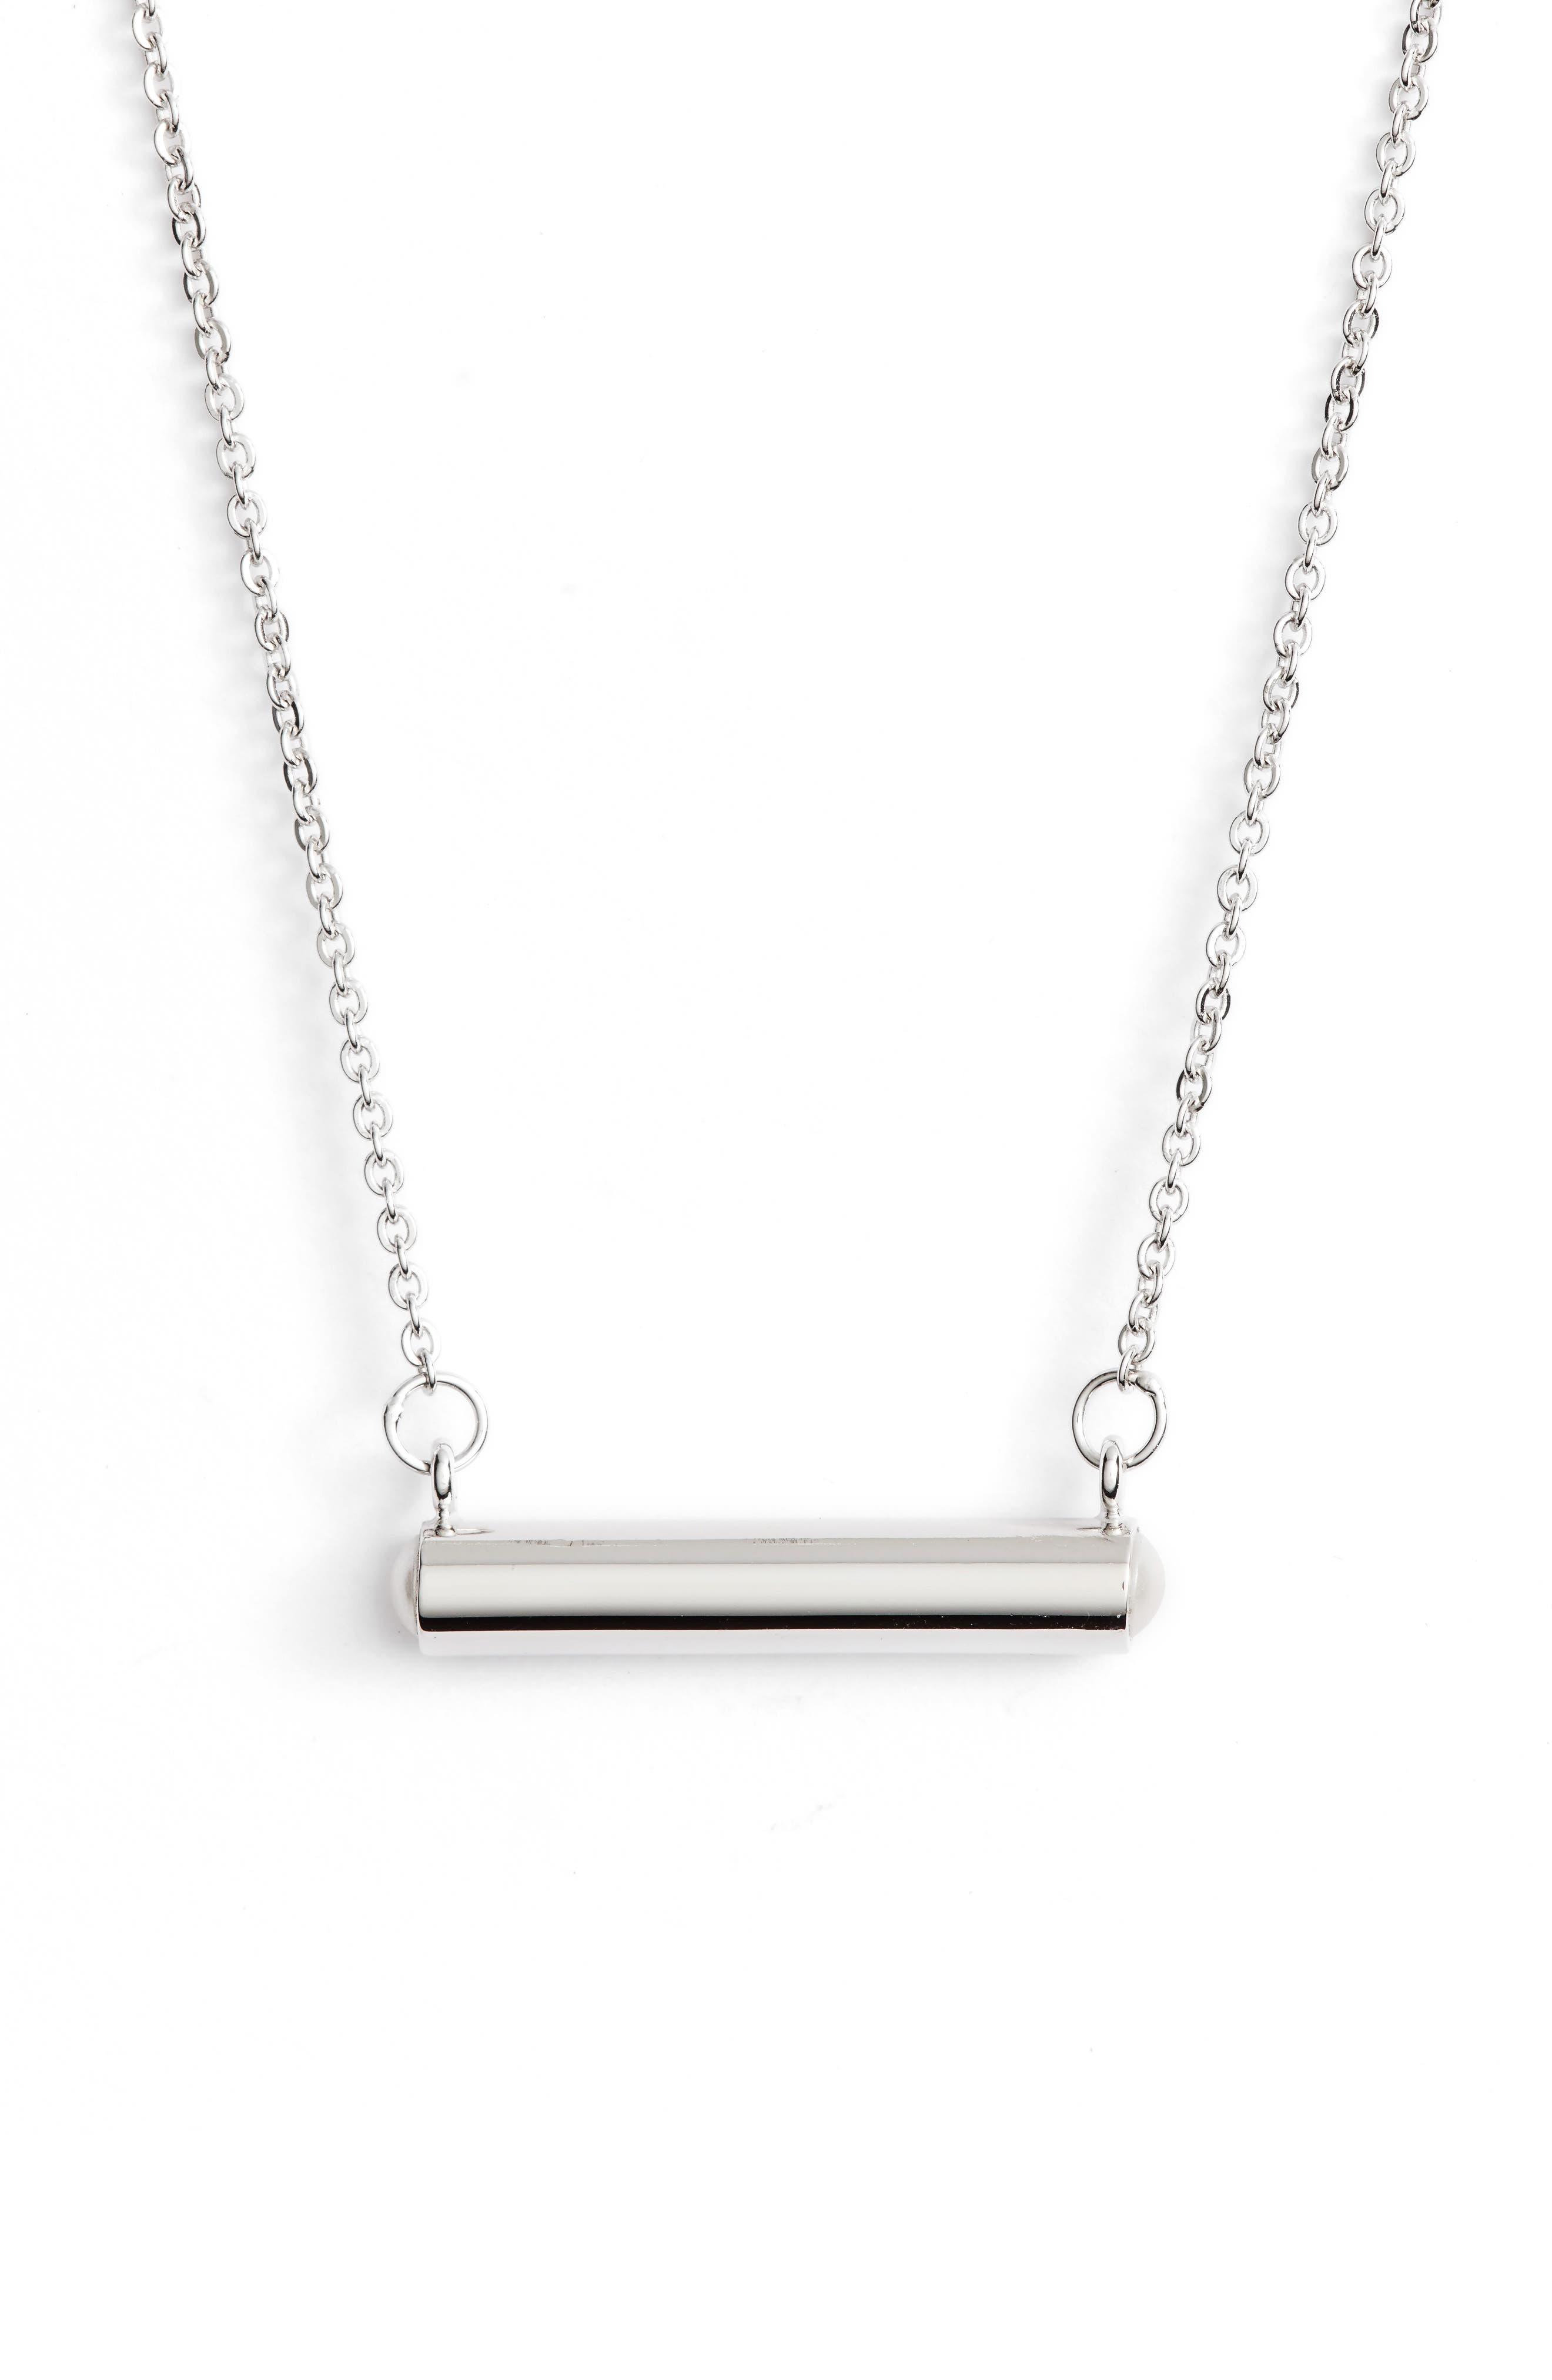 June Imitation Pearl Bar Pendant Necklace,                             Main thumbnail 1, color,                             SILVER